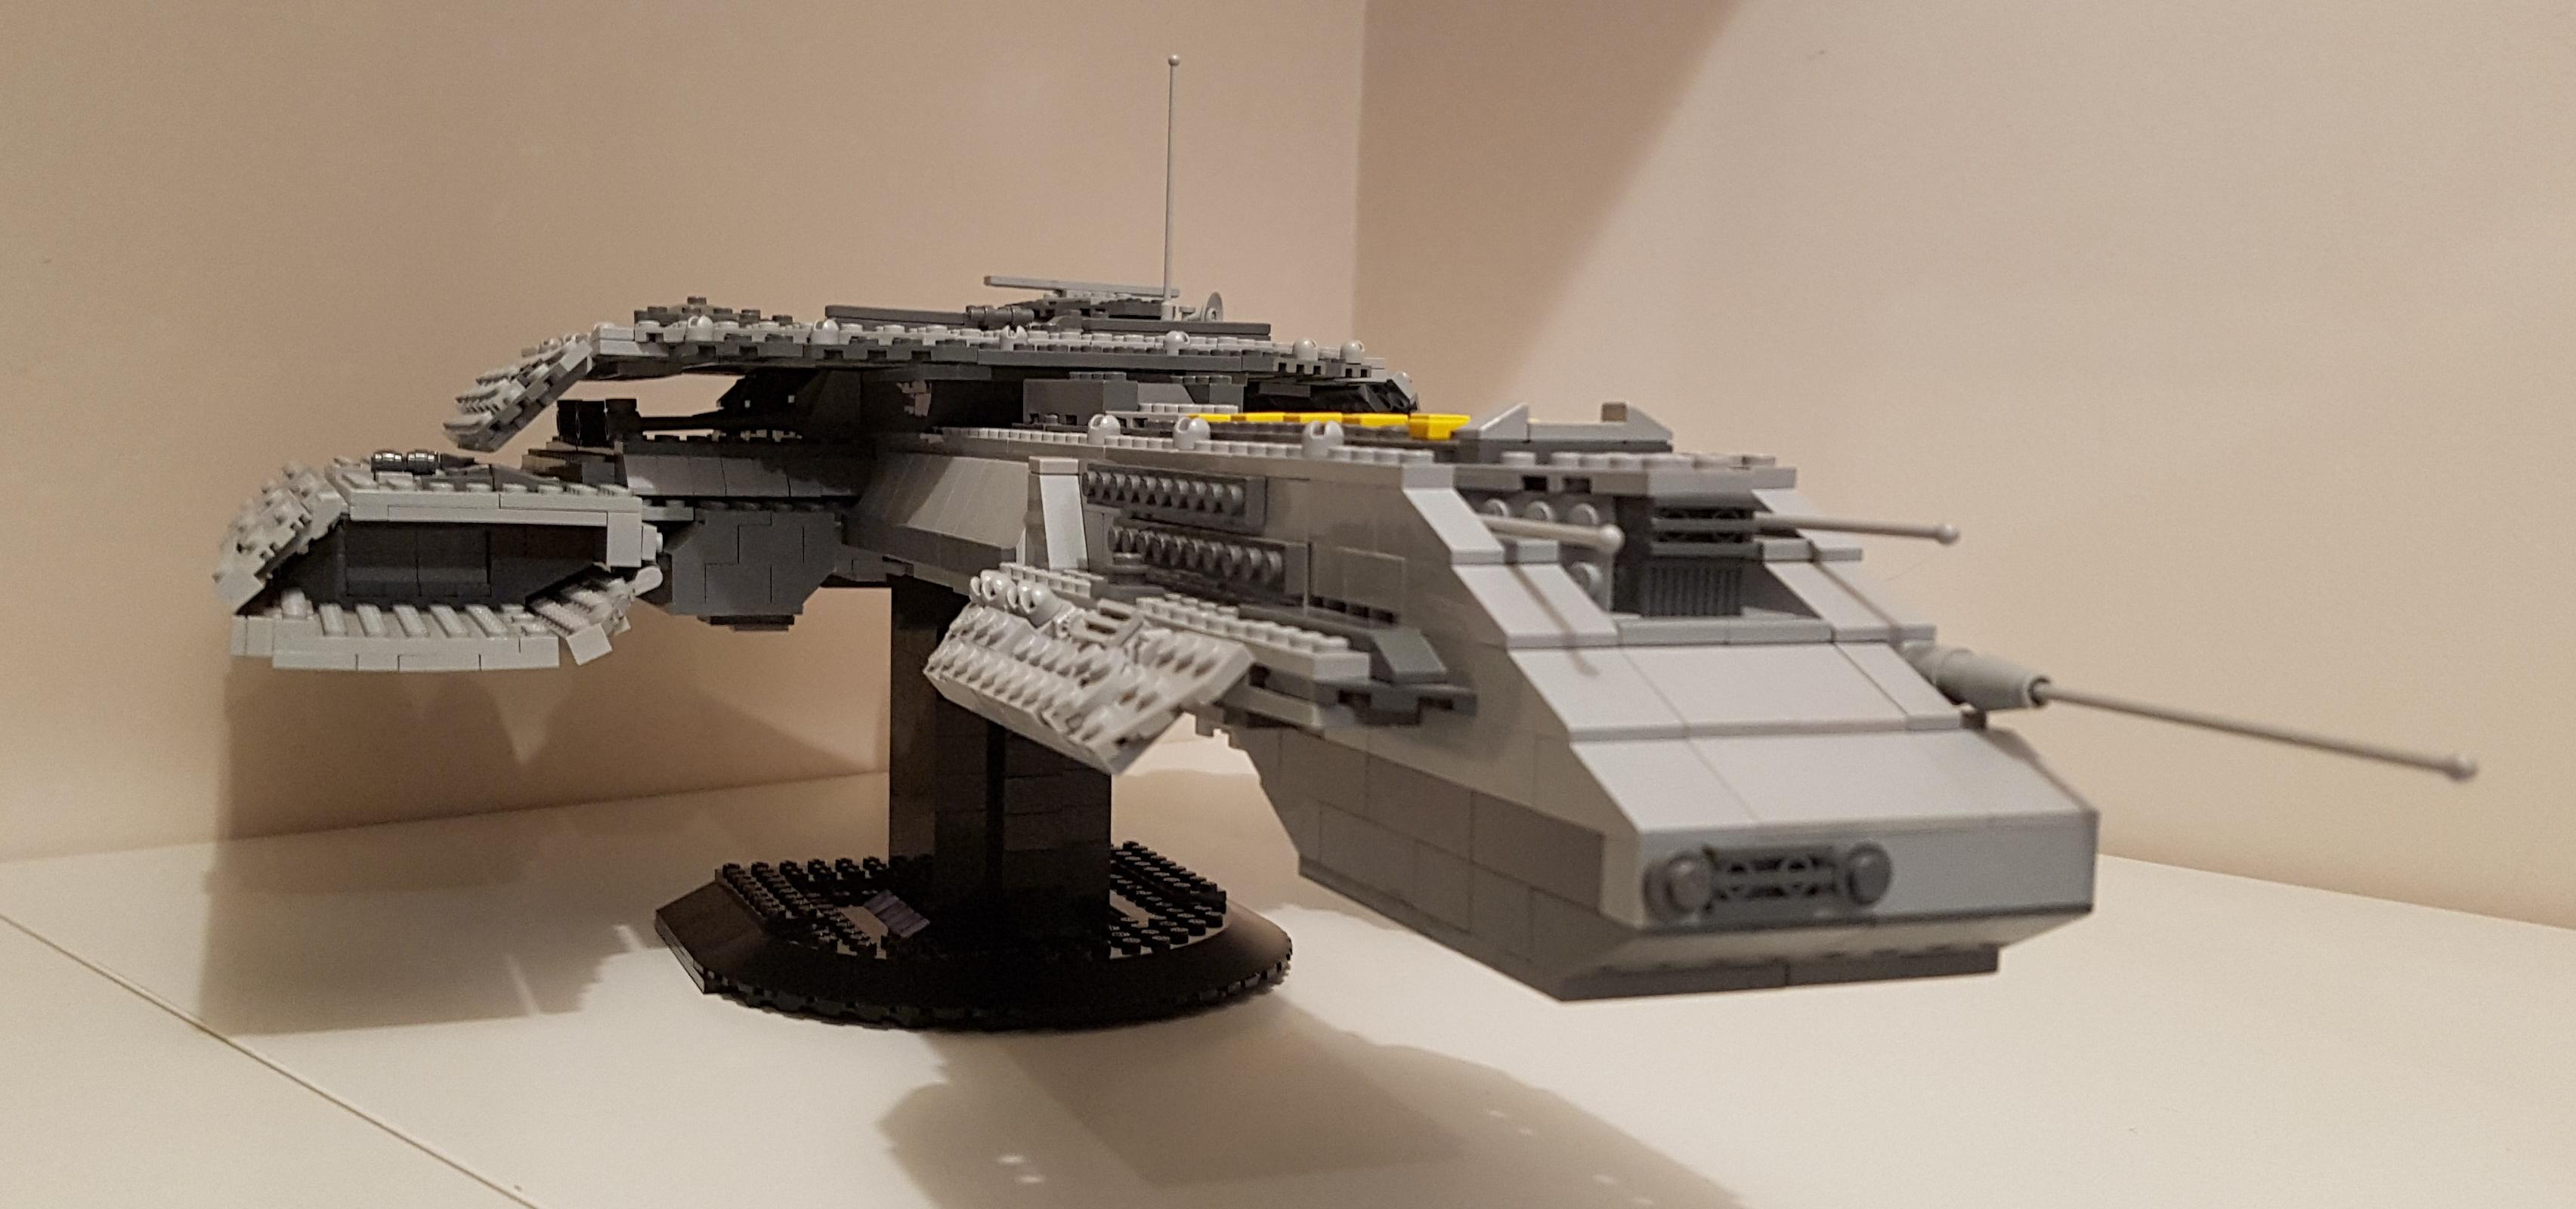 LEGO Stargate USS Daedalus